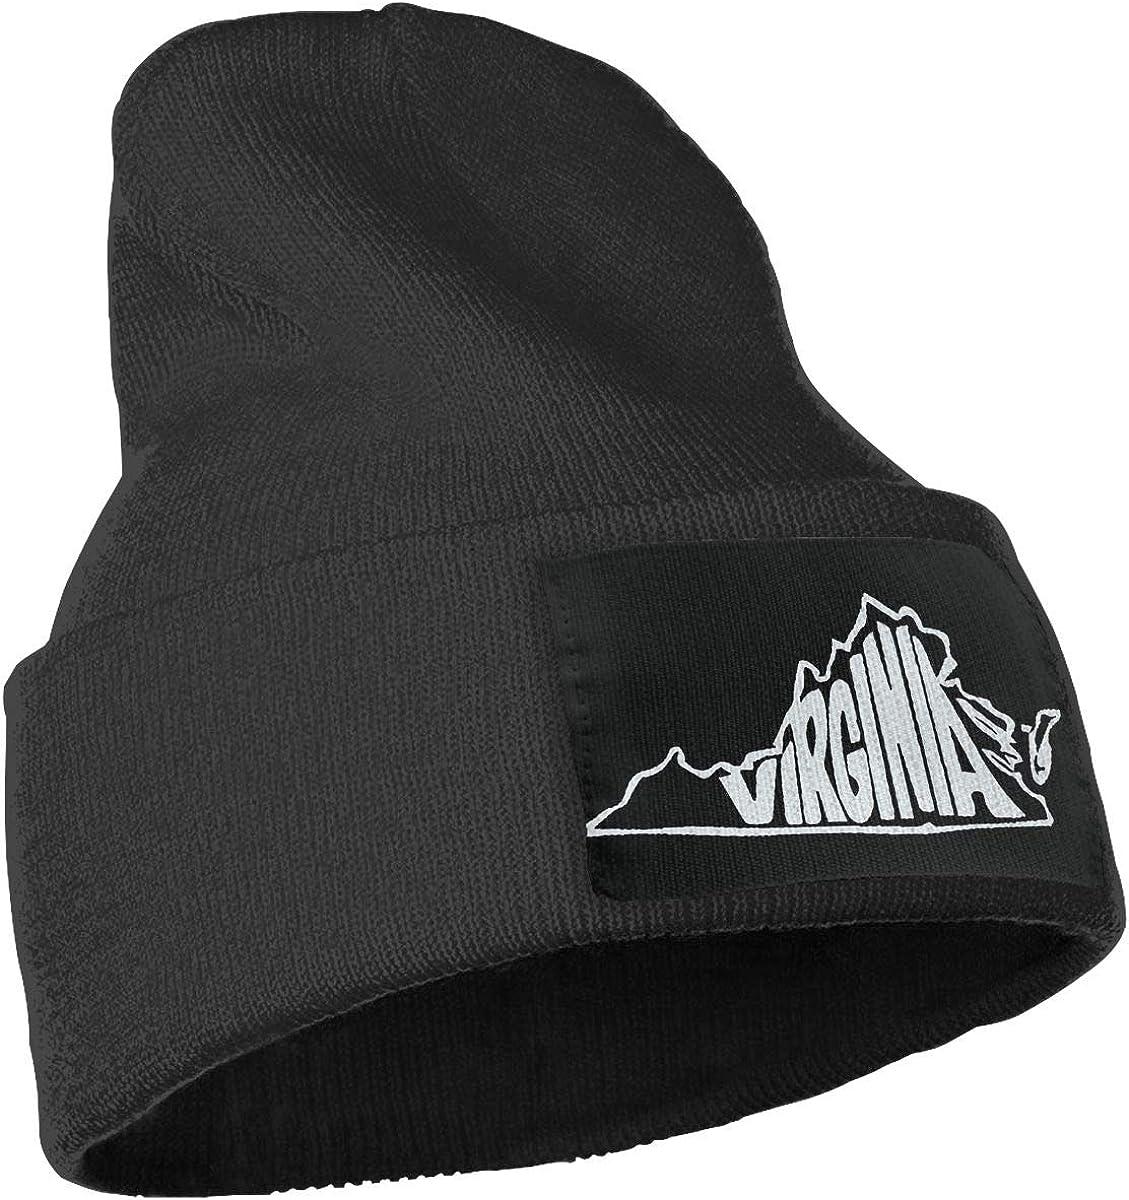 SLADDD1 Virginia State Warm Winter Hat Knit Beanie Skull Cap Cuff Beanie Hat Winter Hats for Men /& Women